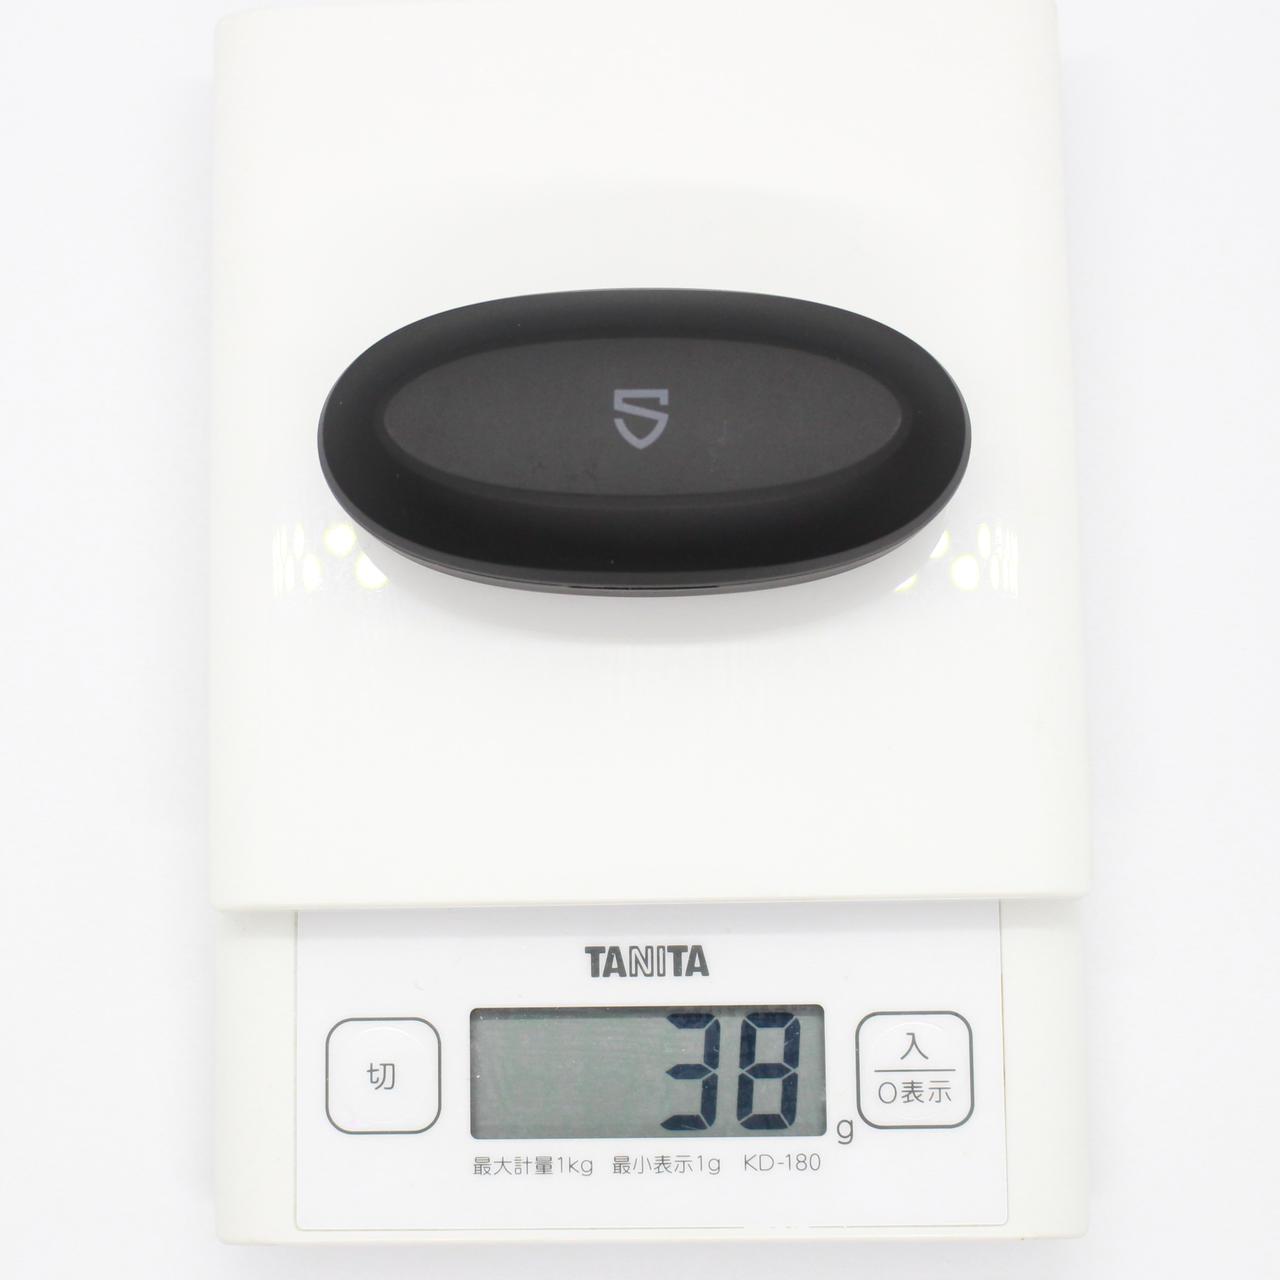 SOUNDPEATS TrueCapsule|ケースの重さも38gと超軽い